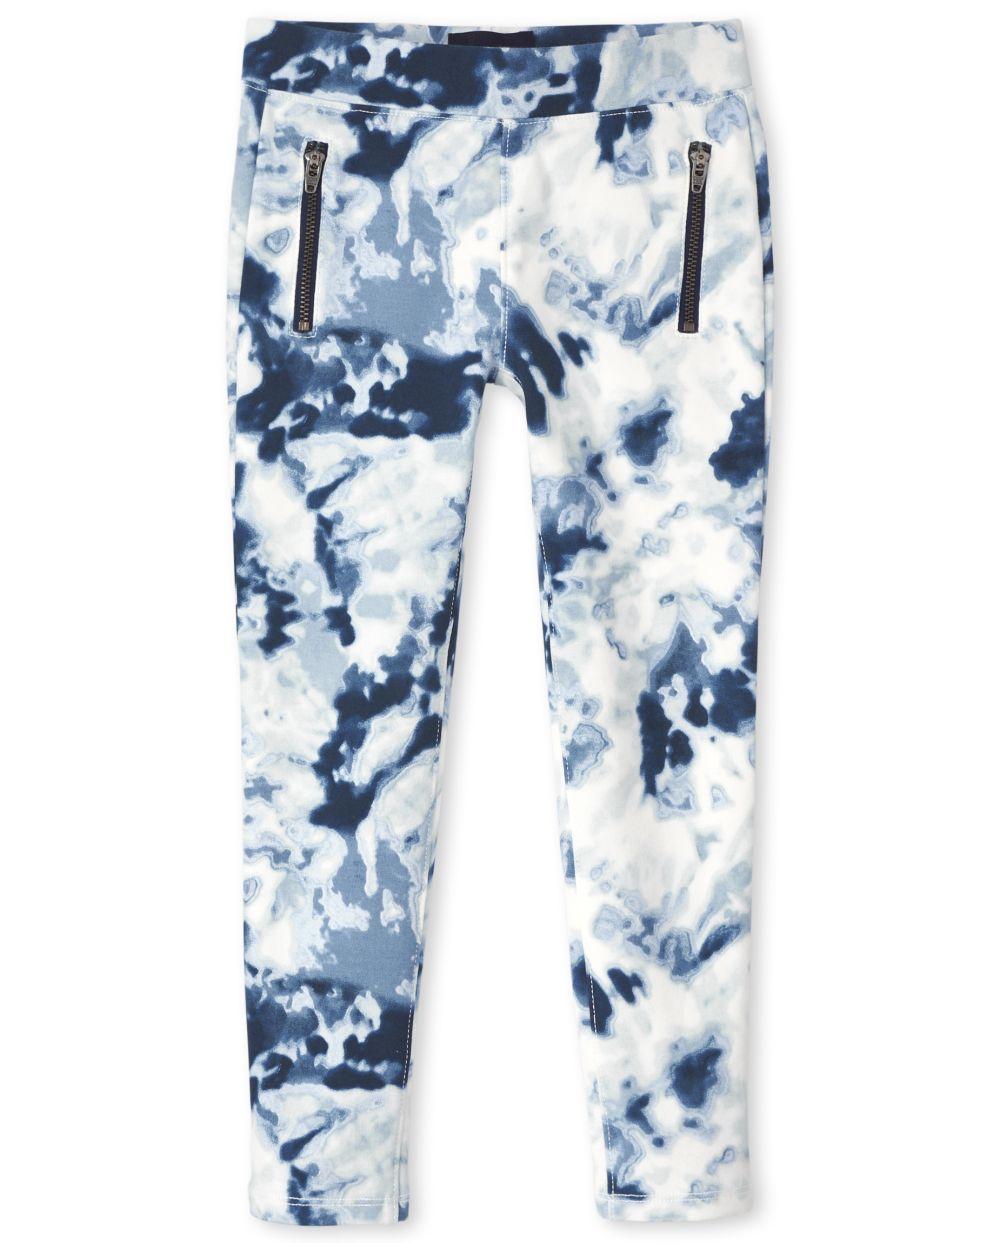 Girls Zip Ponte Knit Pull On Jeggings - Blue